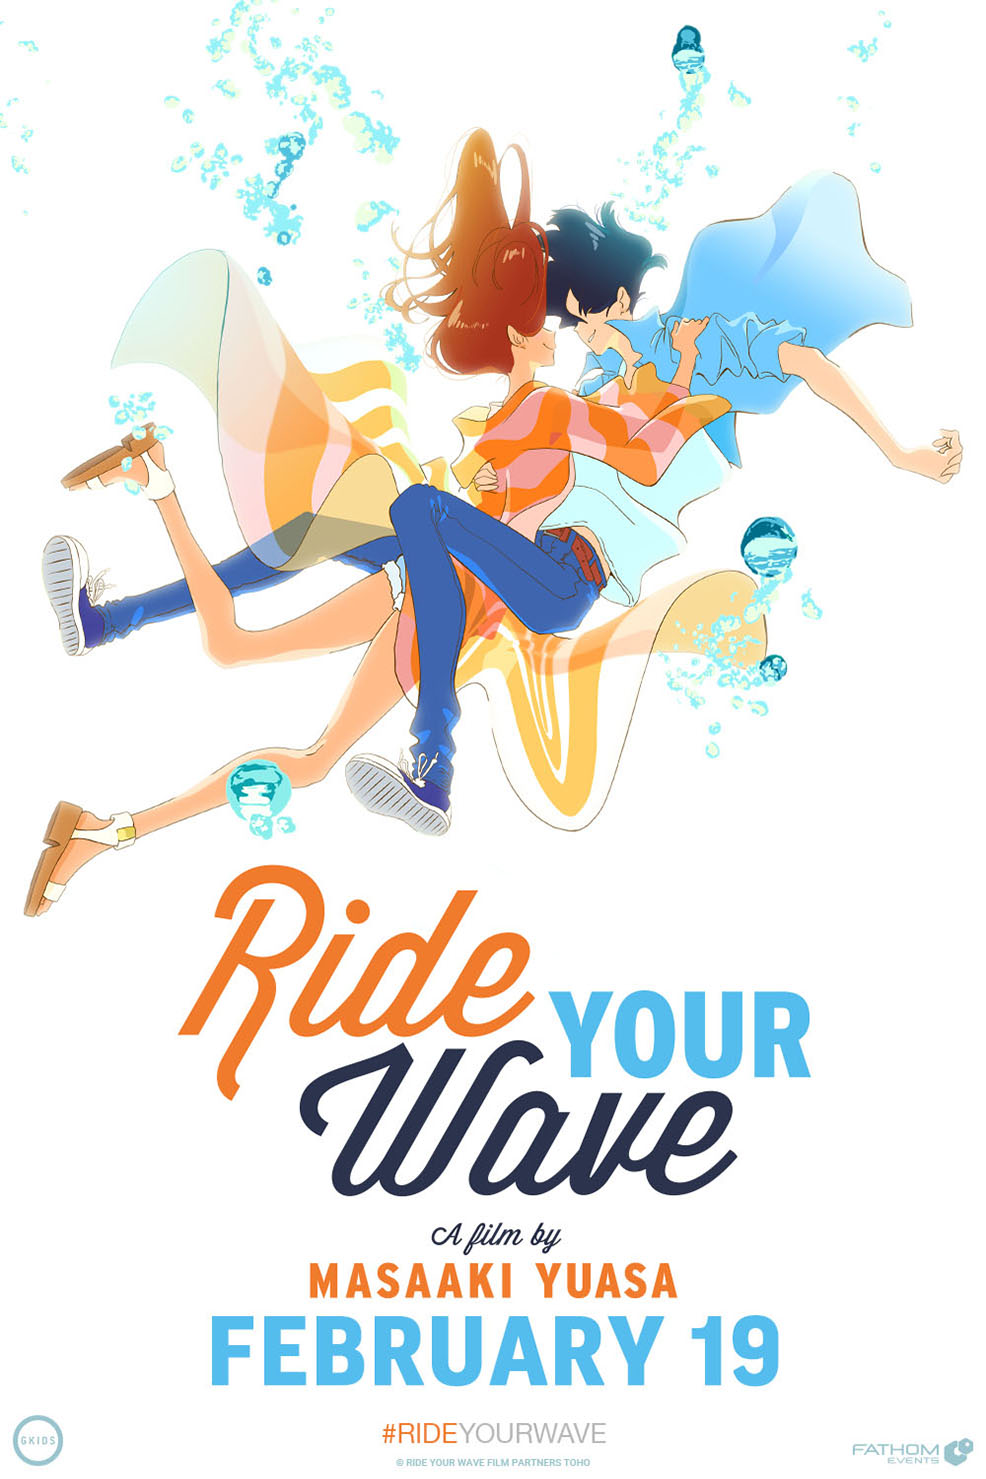 Ride Your Wave (Premiere Event)